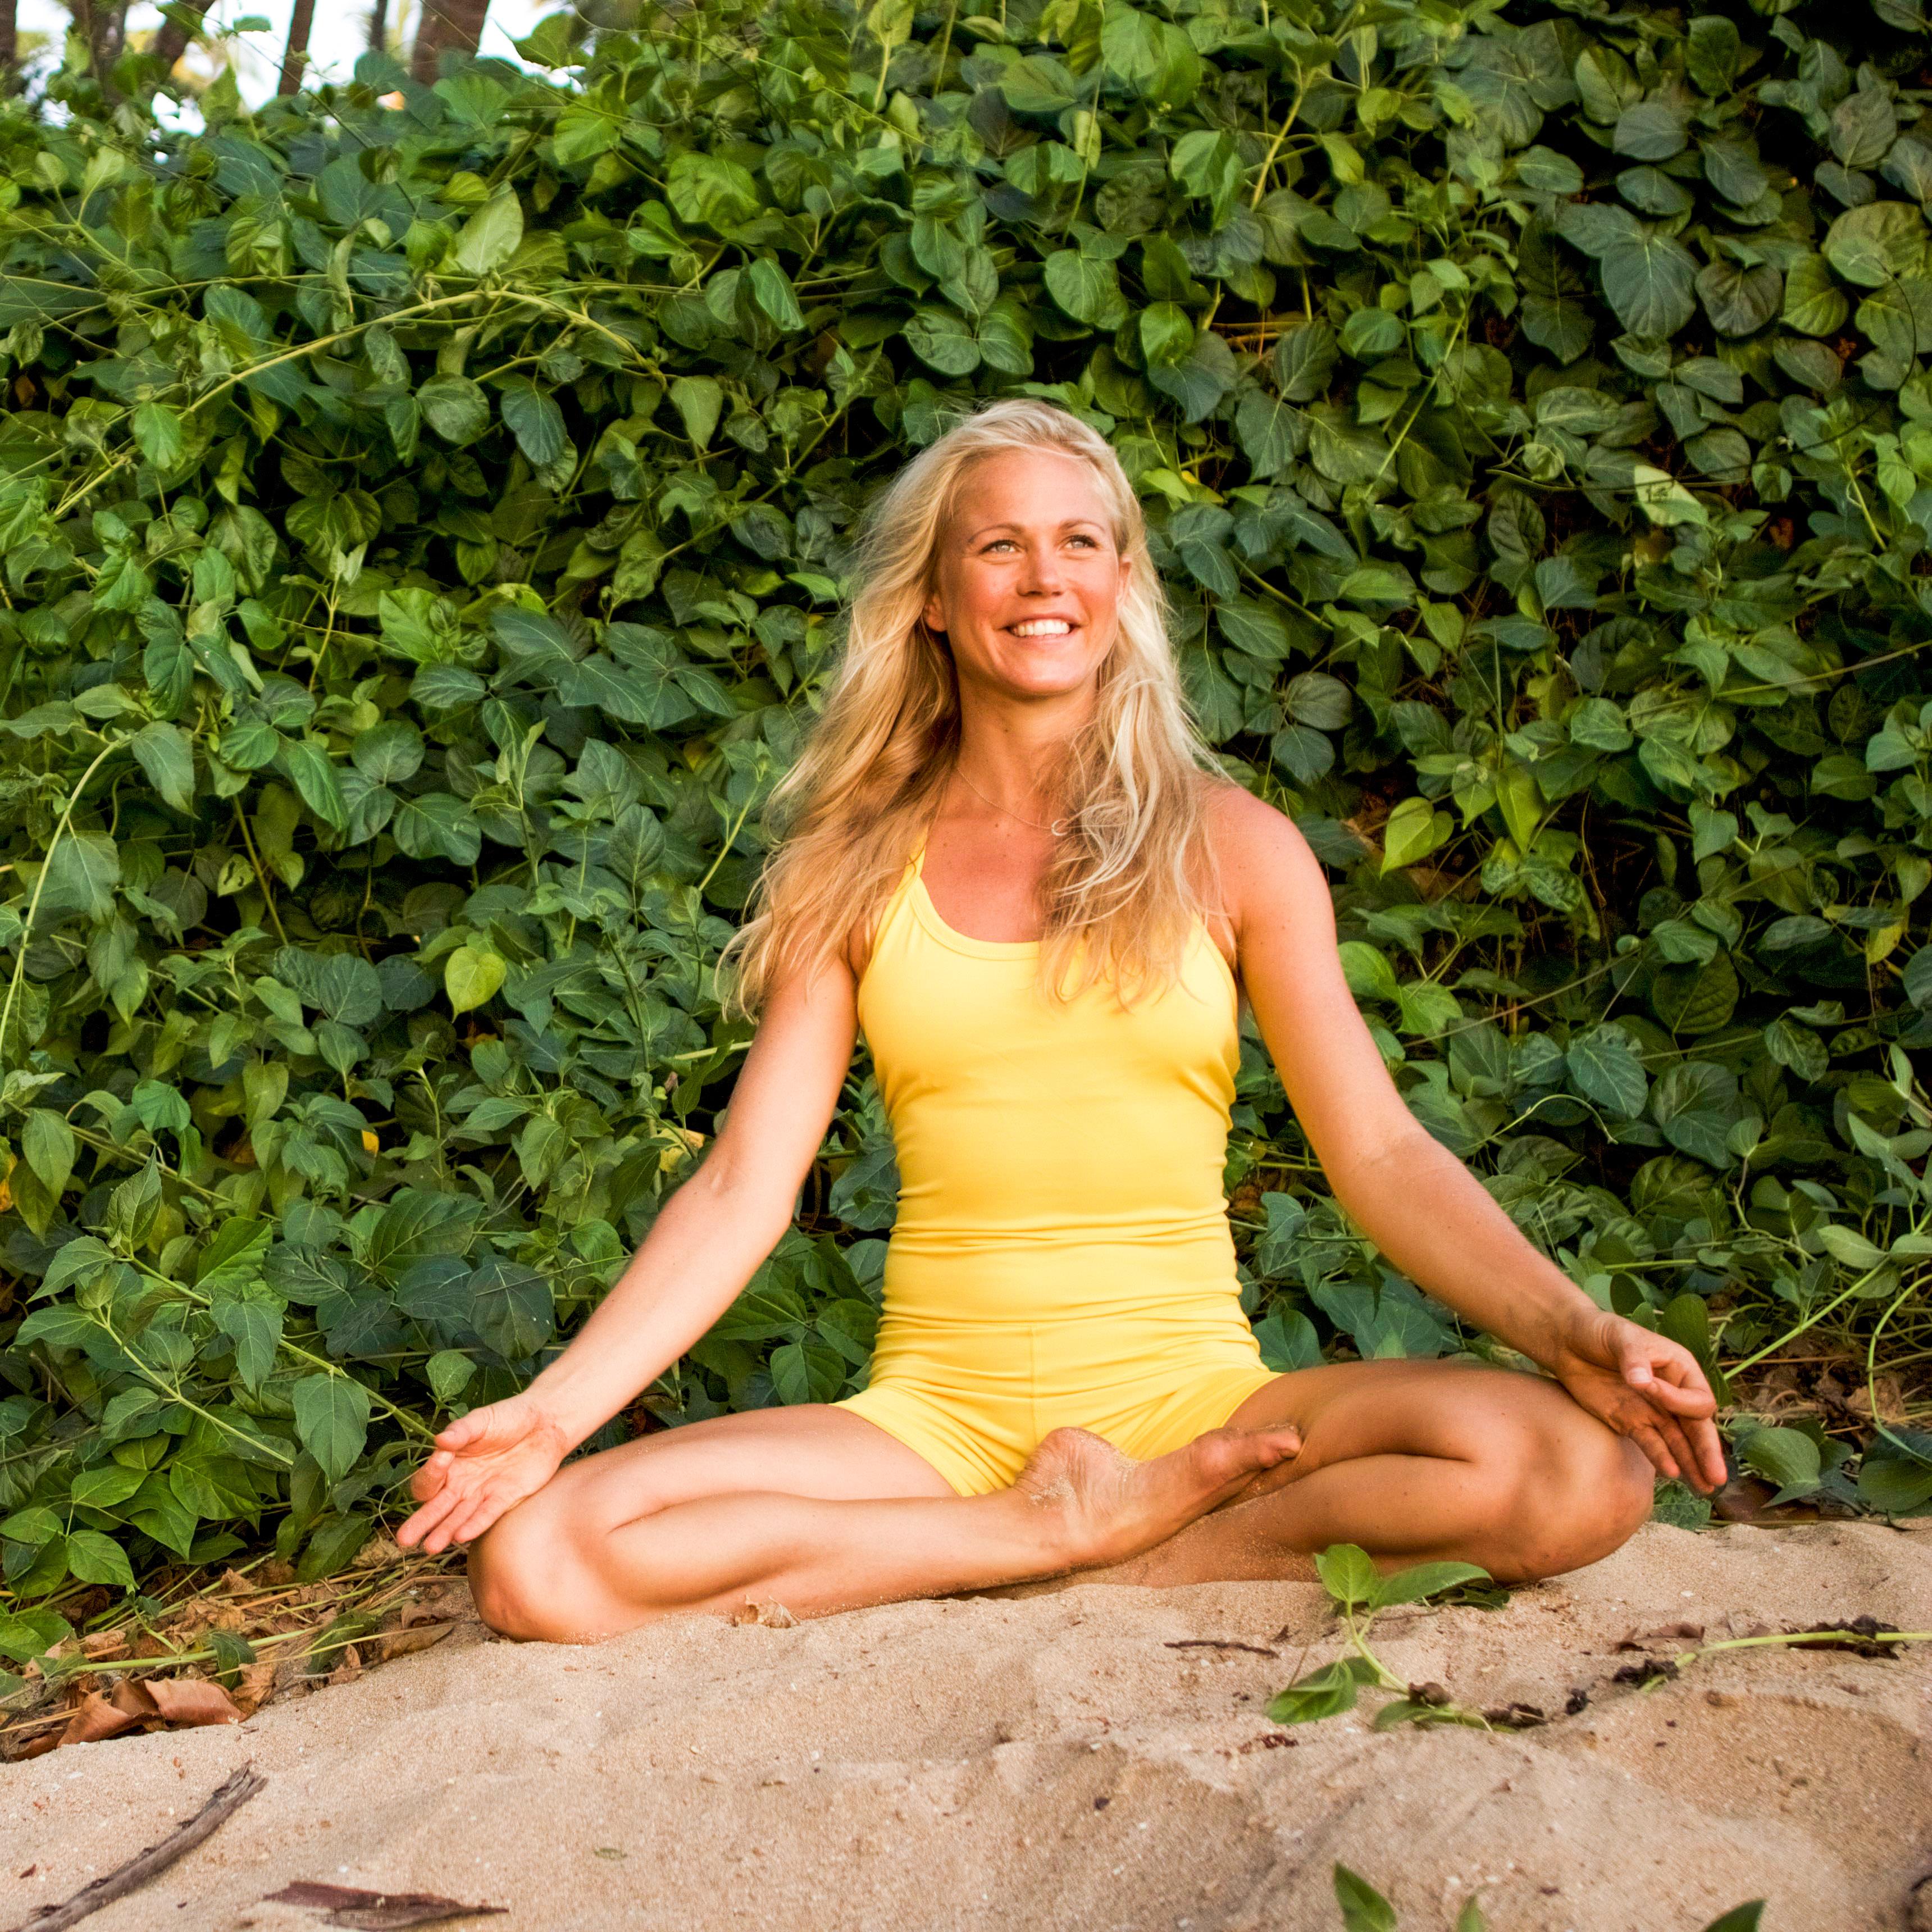 yoga hemma nybörjare